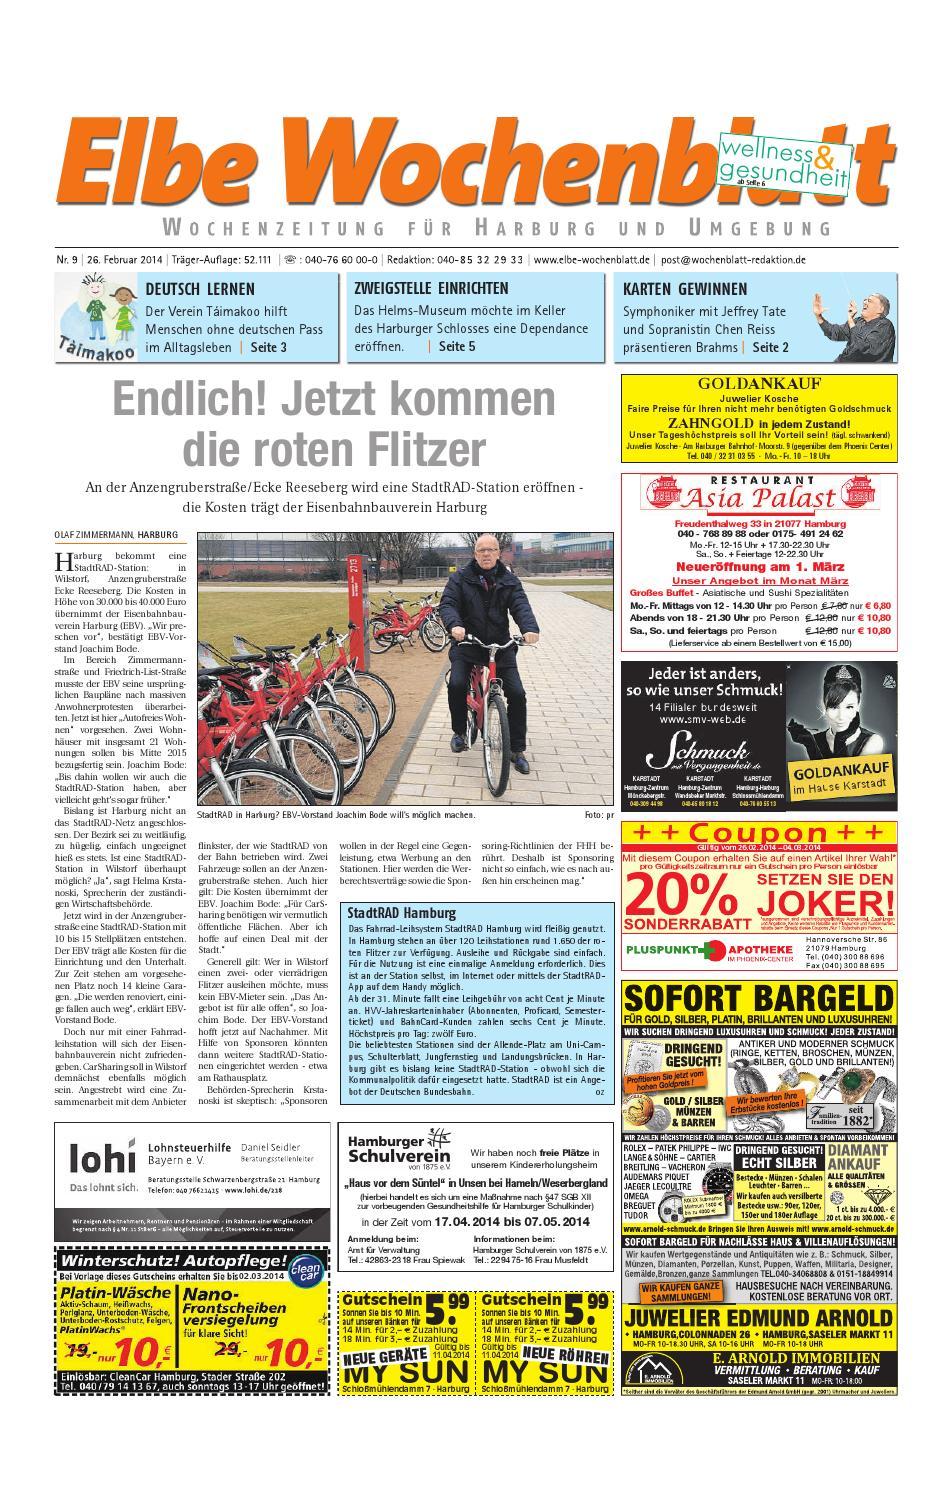 Harburg Kw09 2014 By Elbe Wochenblatt Verlagsgesellschaft Mbh Co